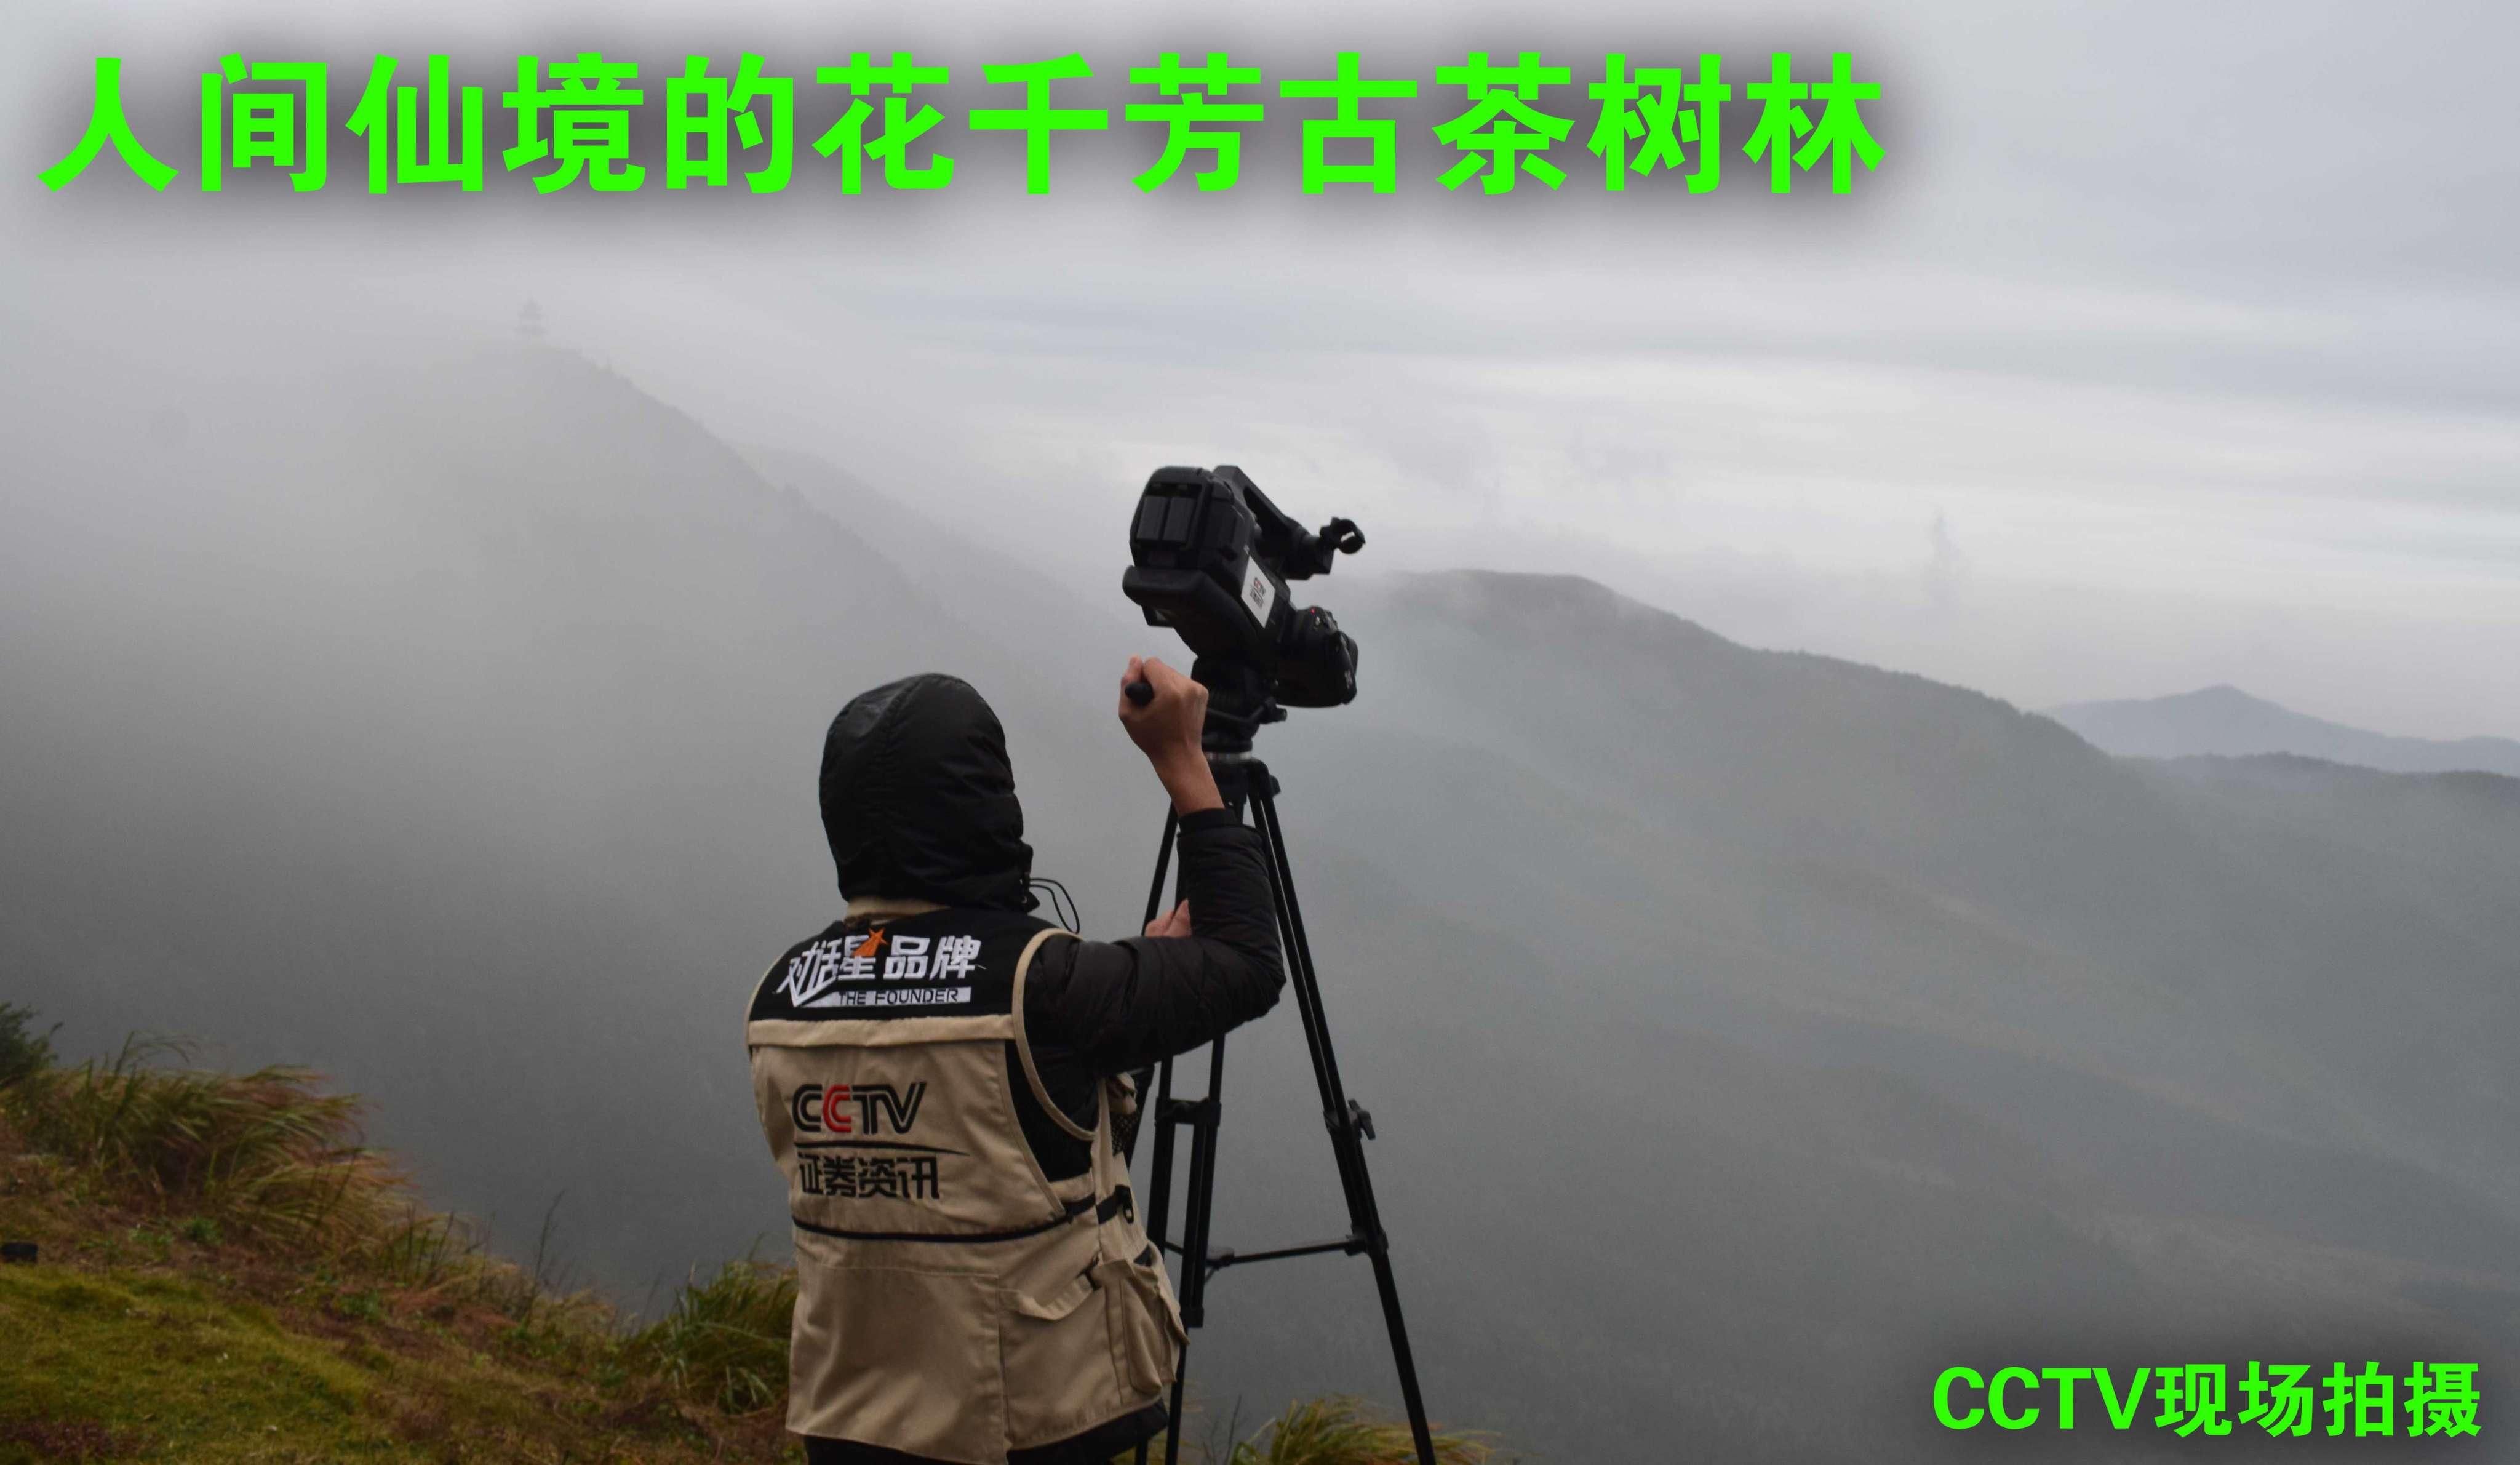 CCTV古茶林中拍攝1.JPG